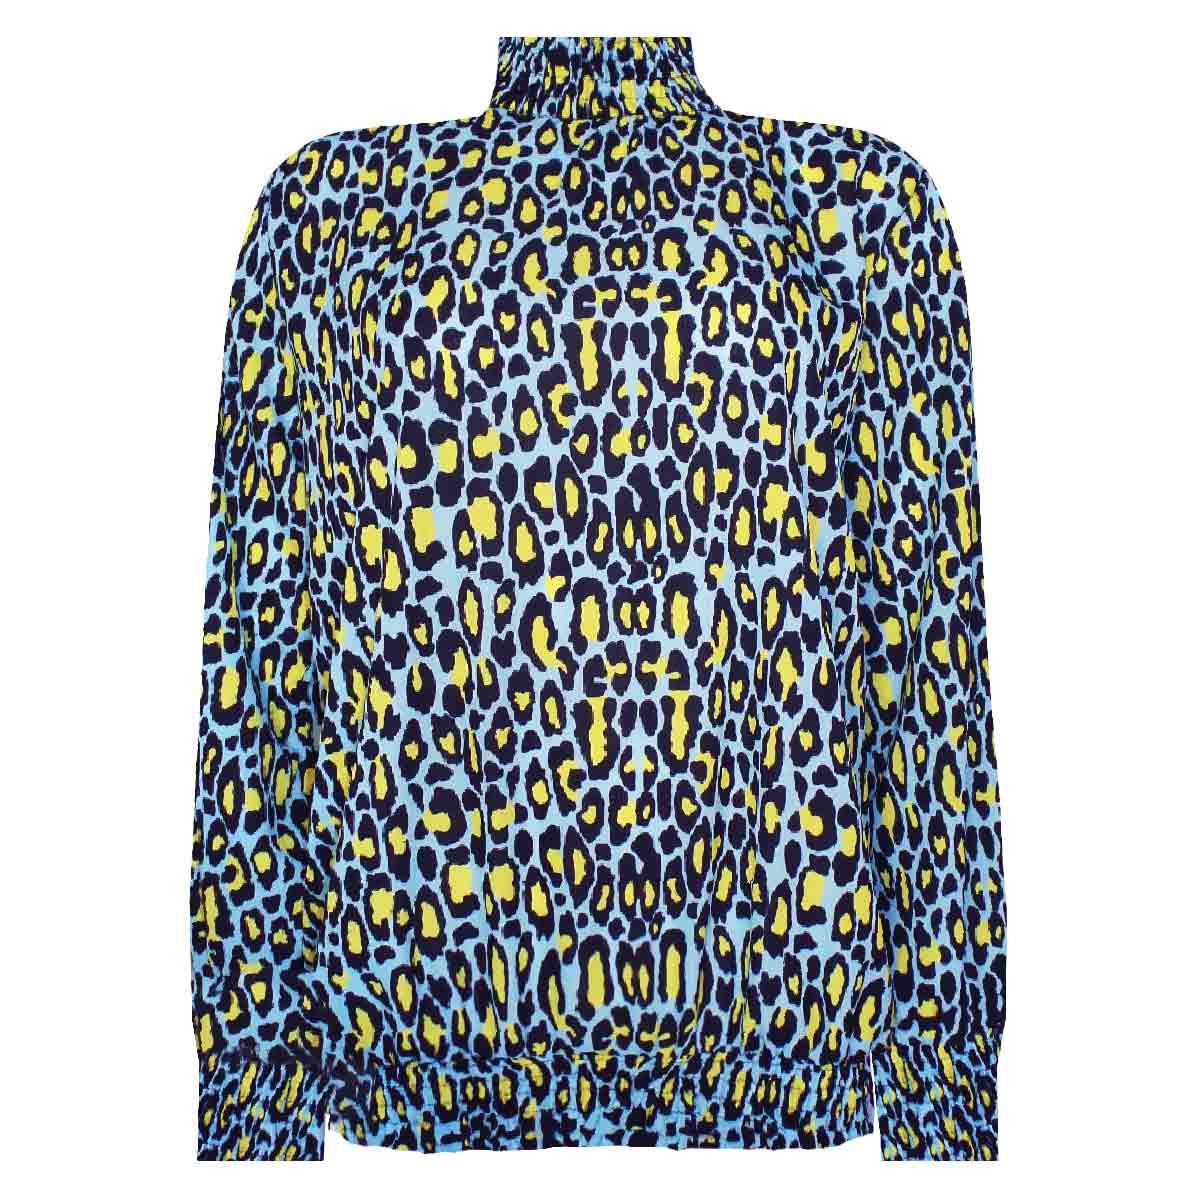 blouse panter